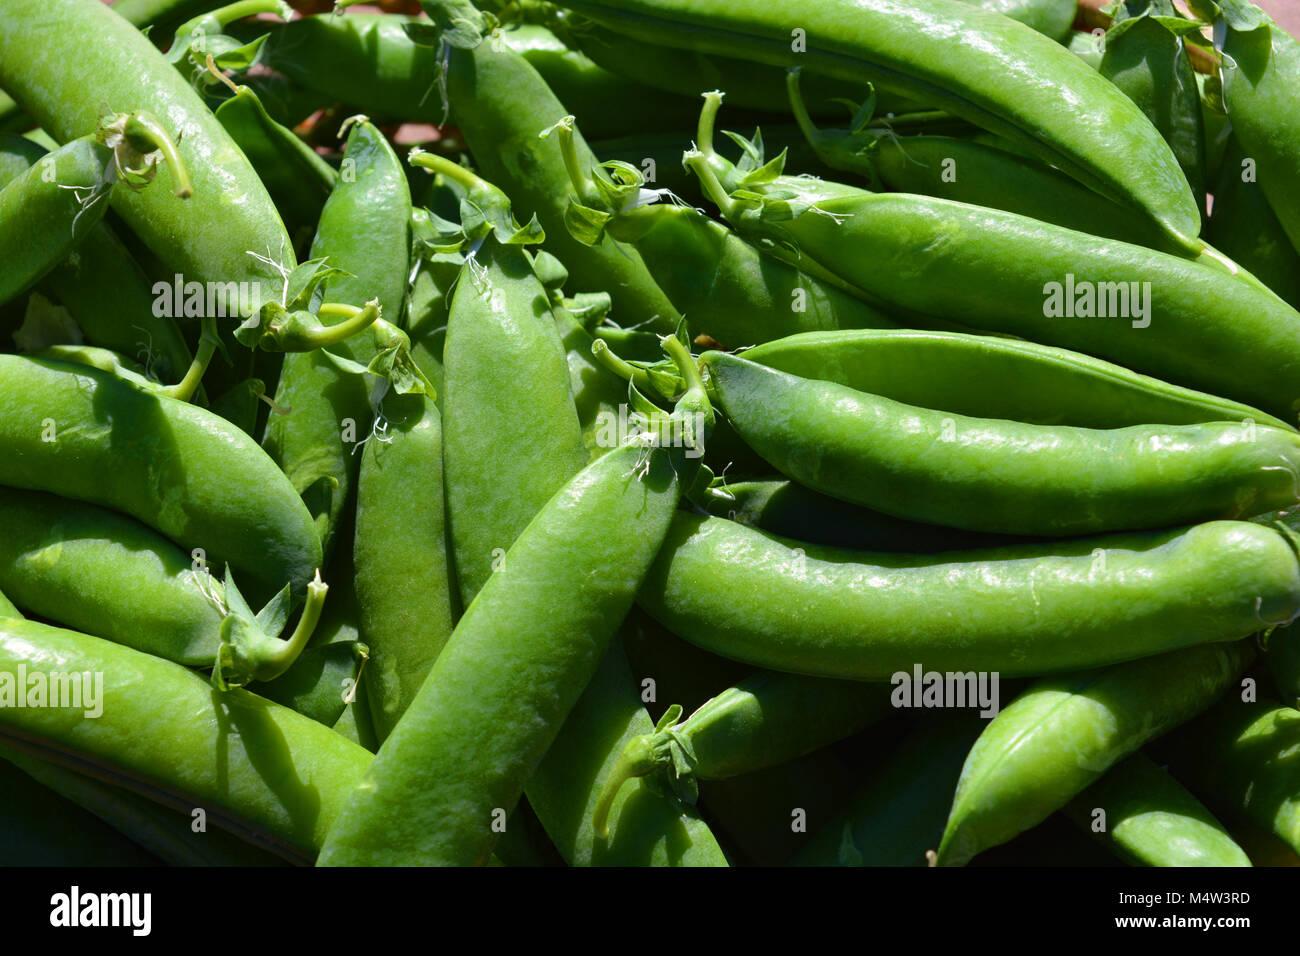 Pisum sativum, freshly picked garden pea pods - Stock Image